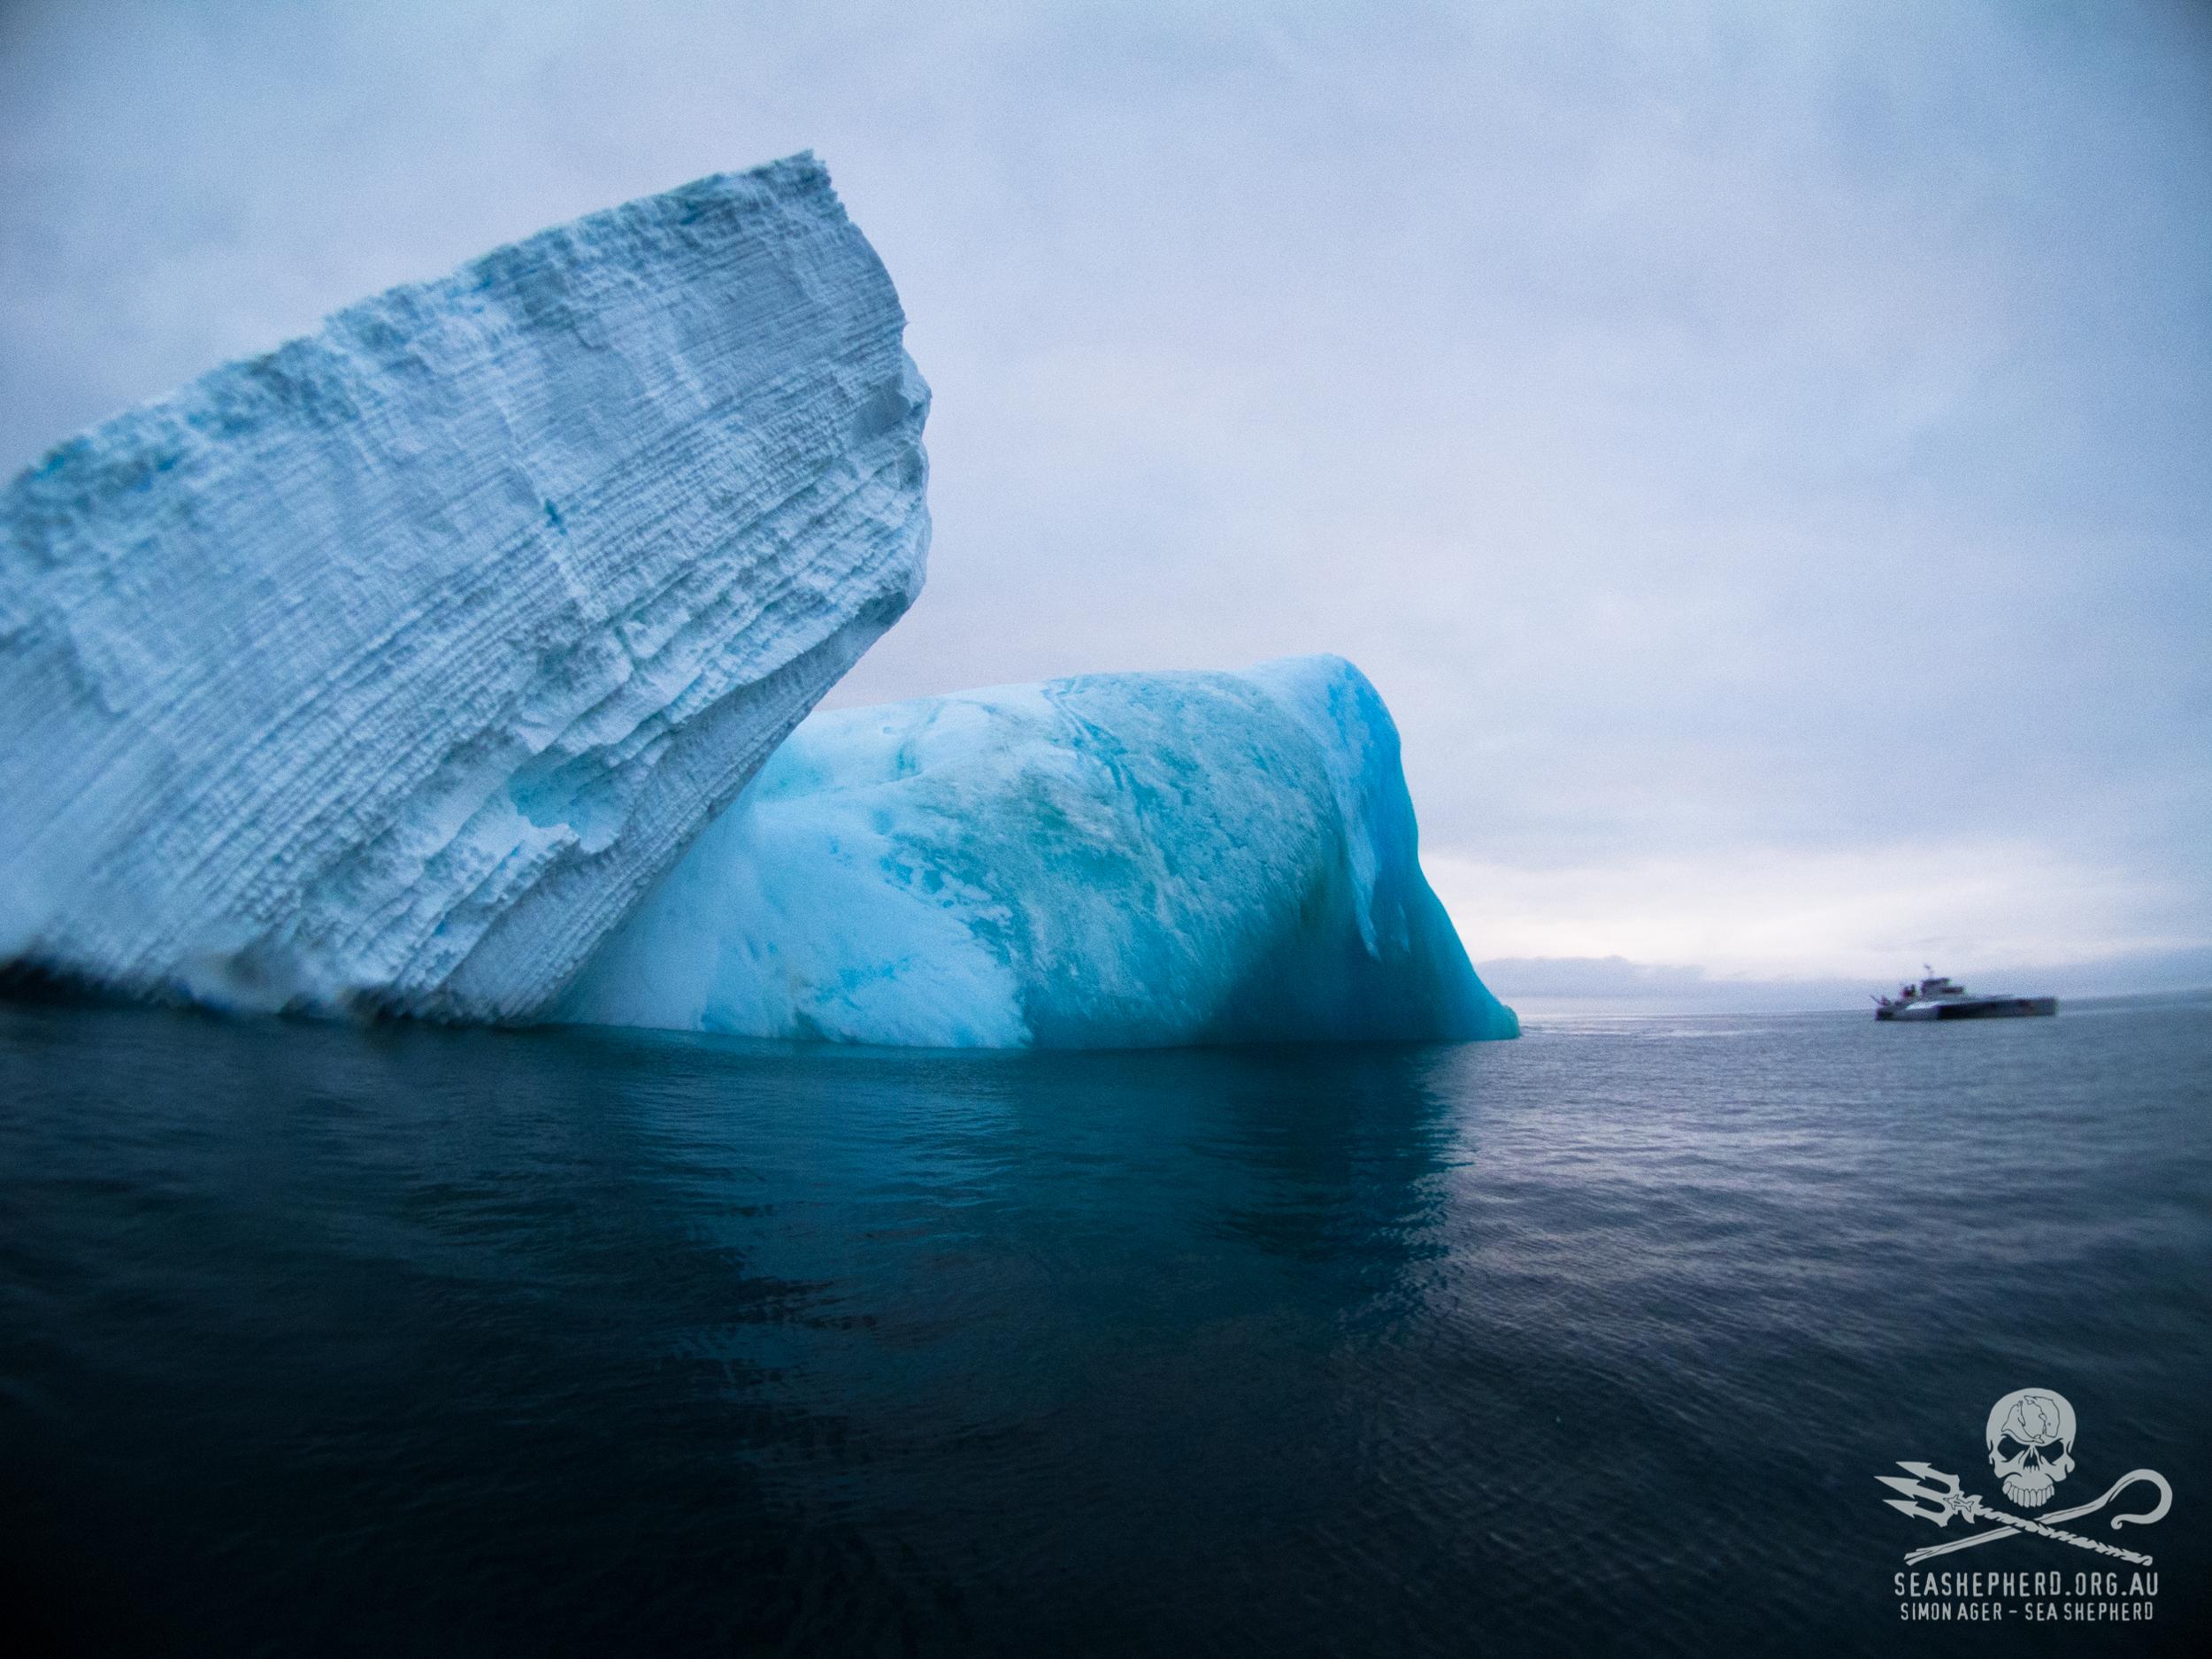 130115_SA_Bardot_passes_iceberg_003.jpg